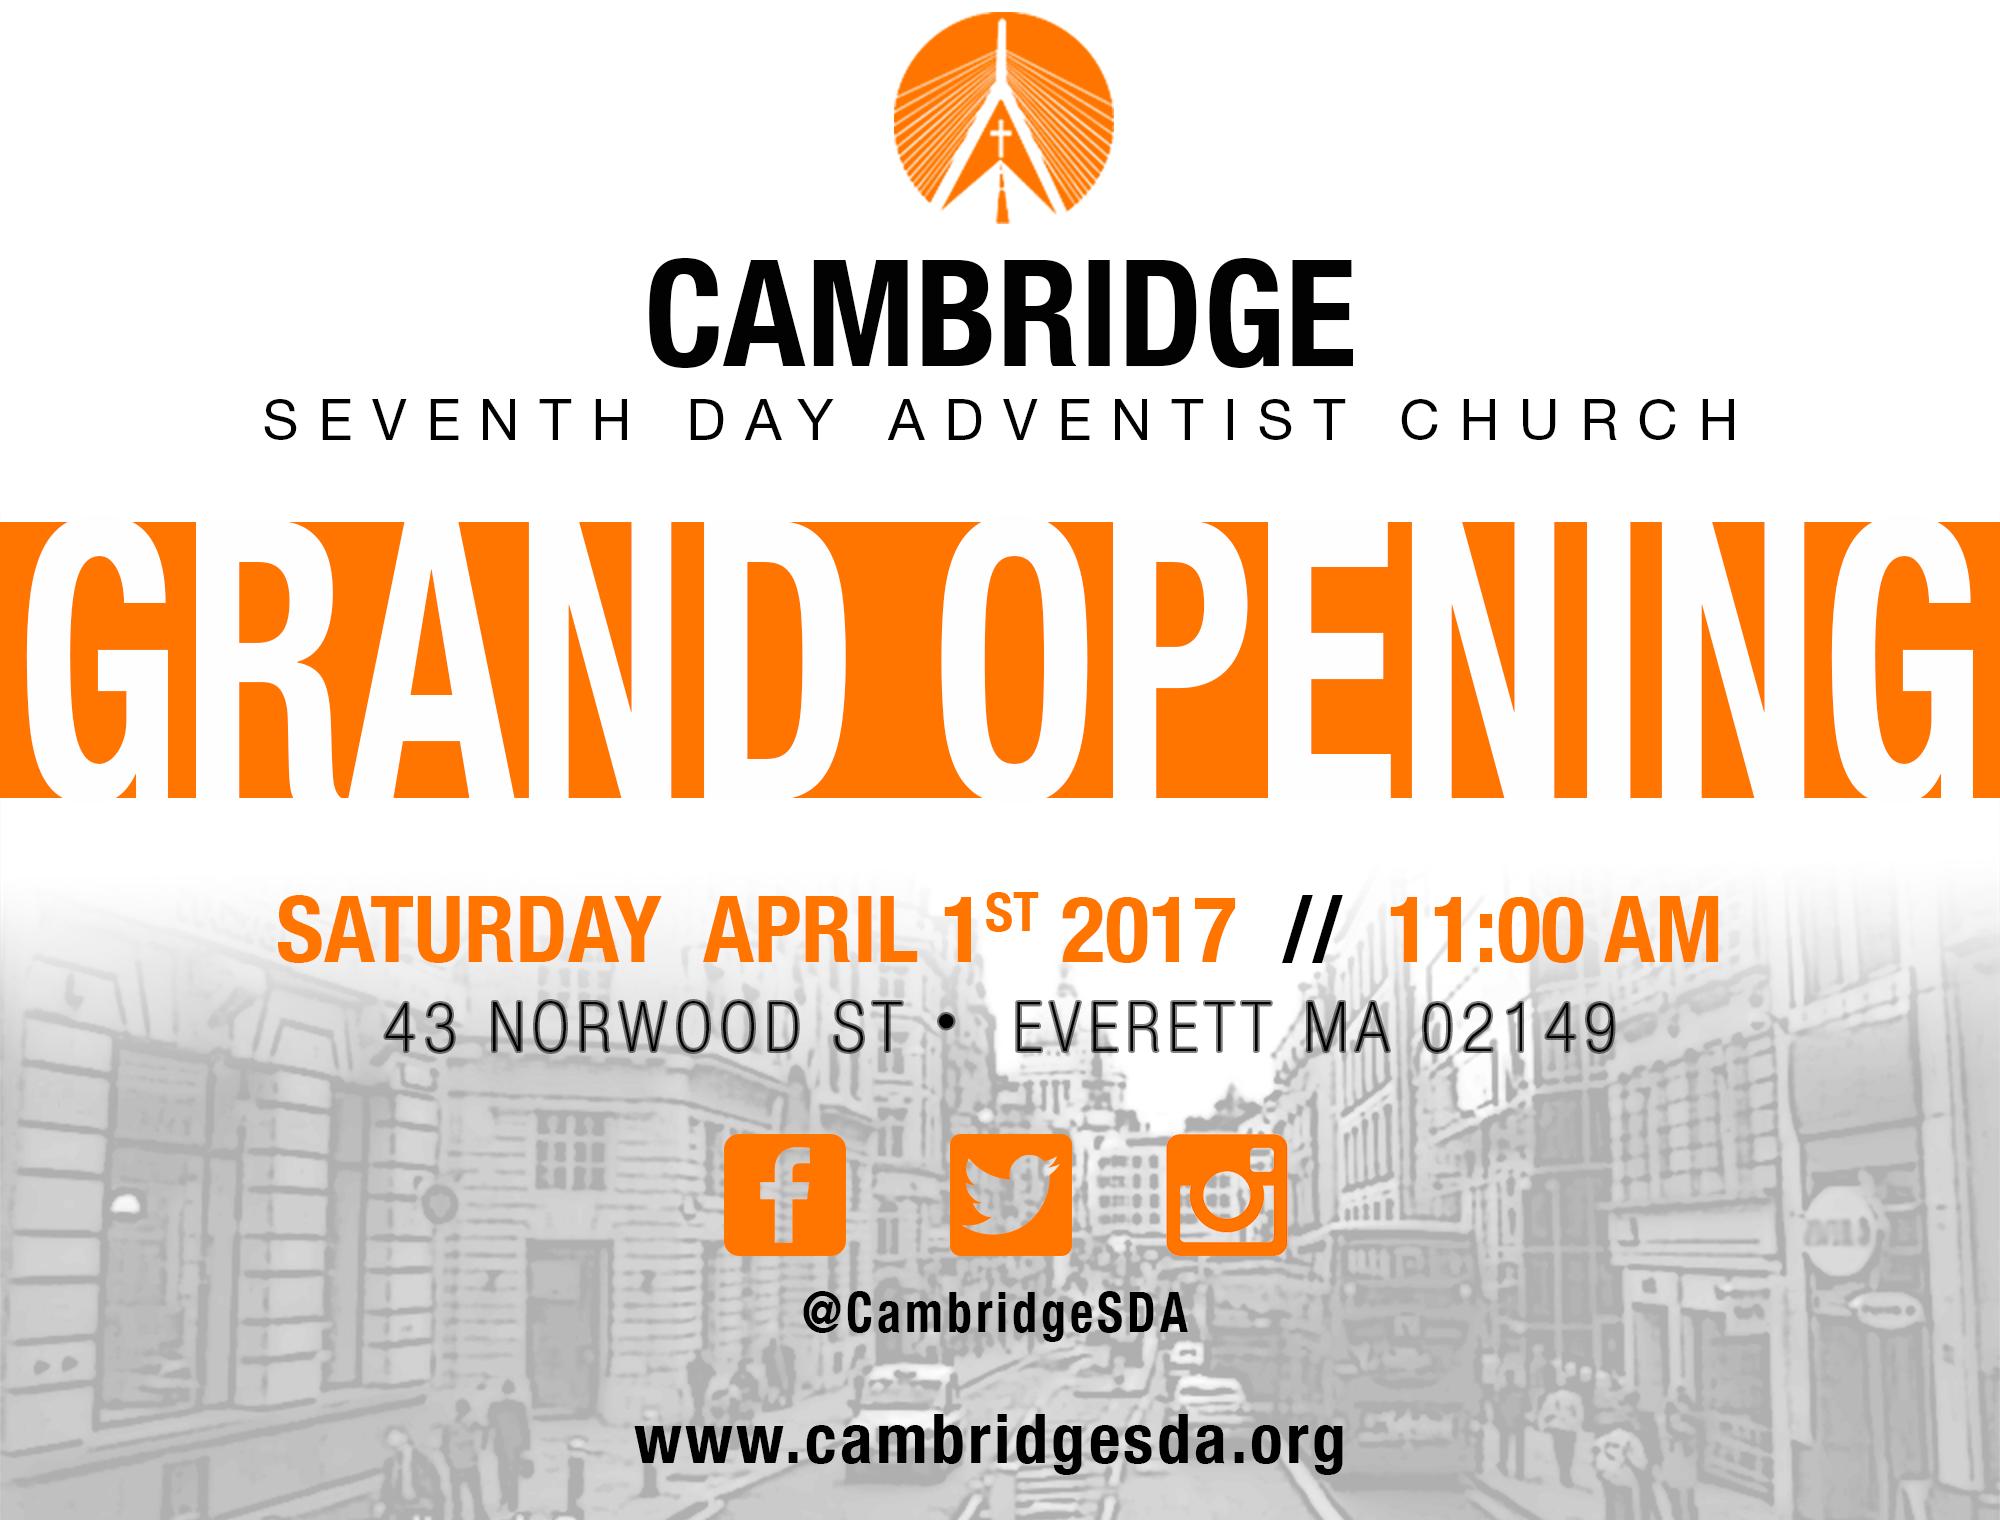 grand opening month � cambridge seventhday adventist church